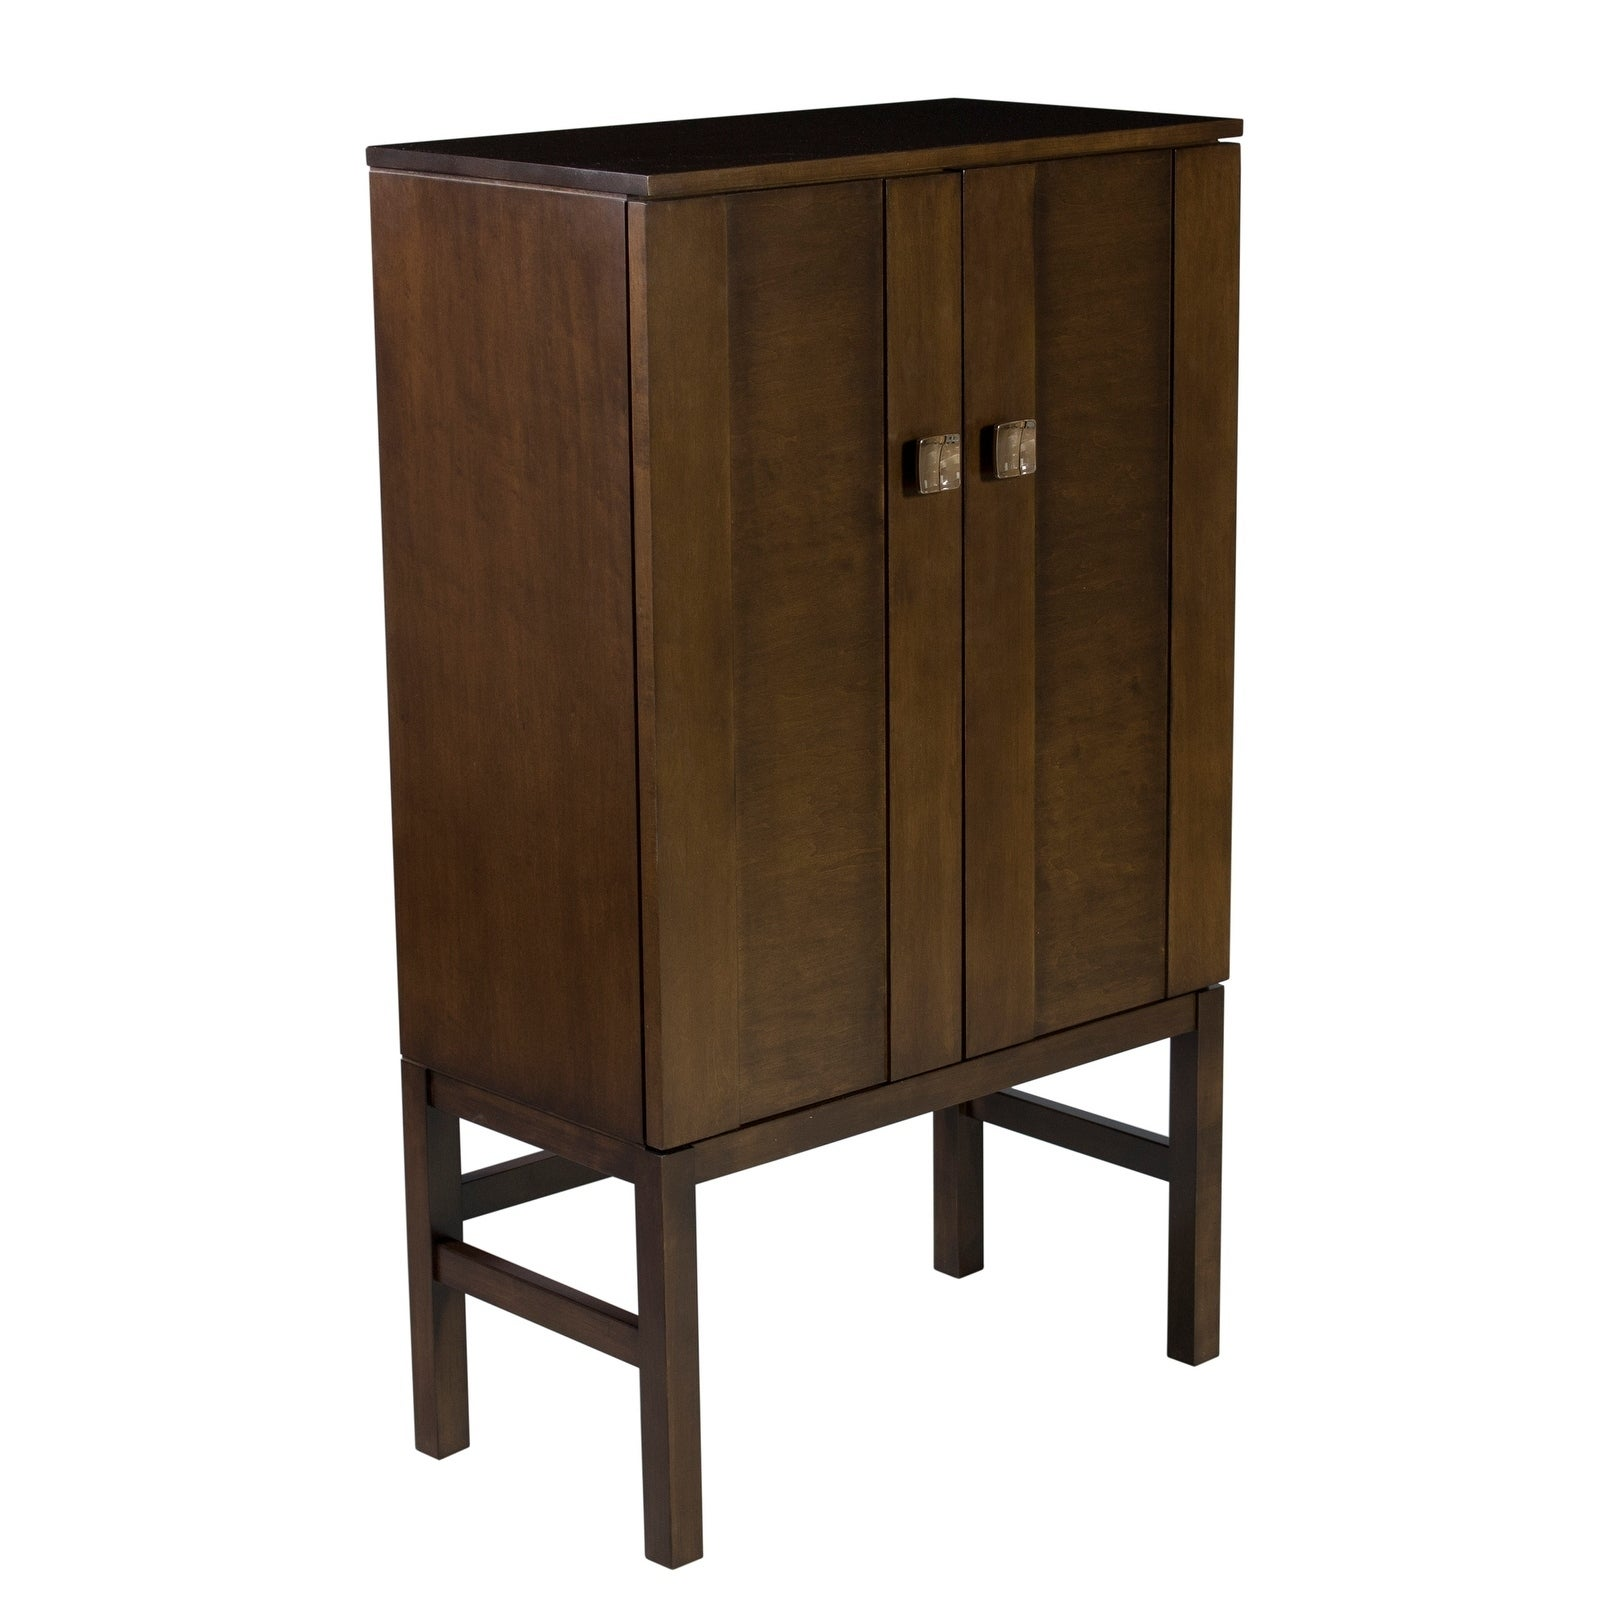 Saloom furniture 55 storage cabinet